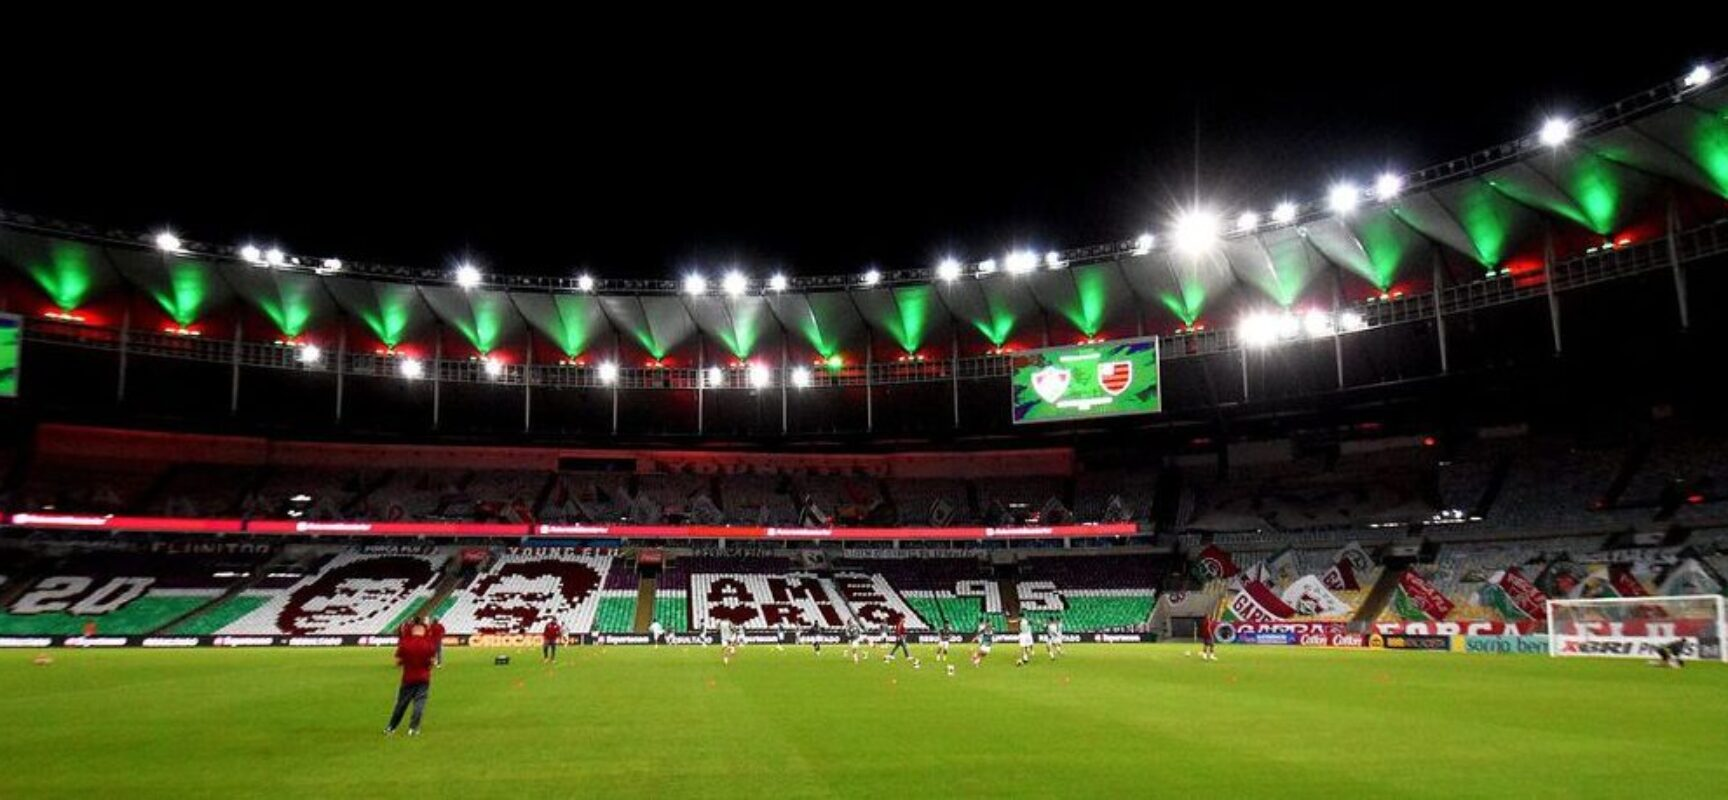 BRASILEIRÃO: Embalado, Fluminense recebe lanterna Grêmio pelo Brasileiro